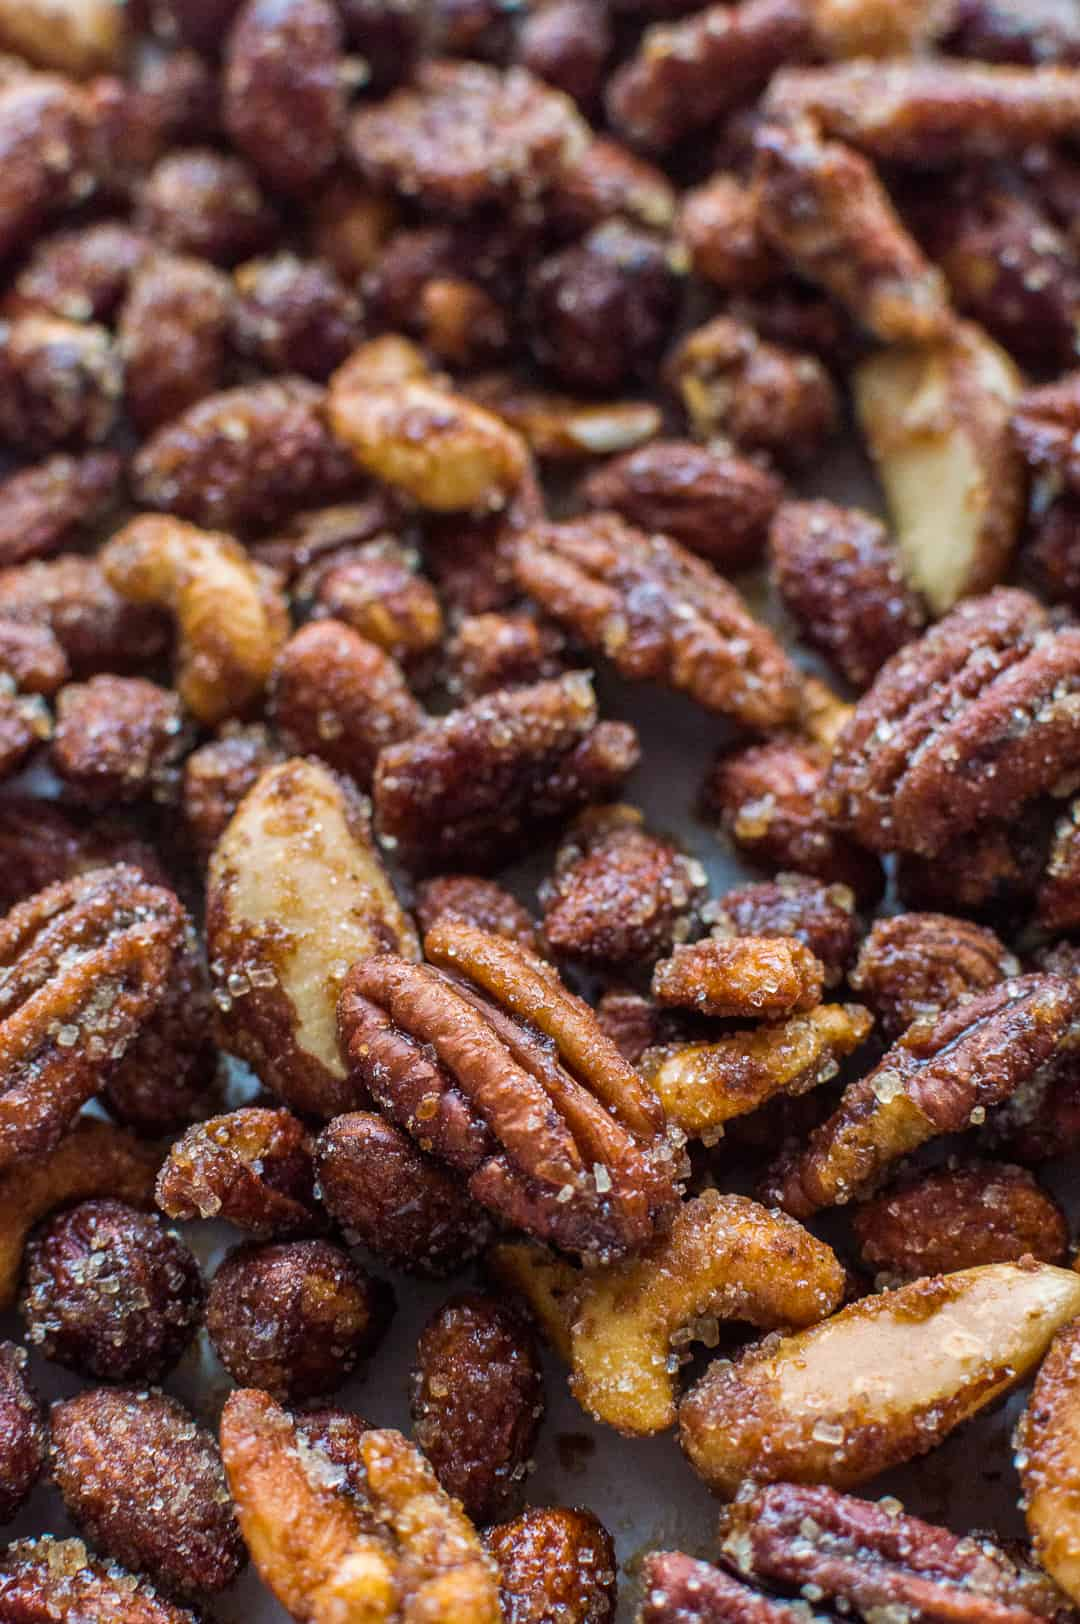 Spicy honey roast nuts